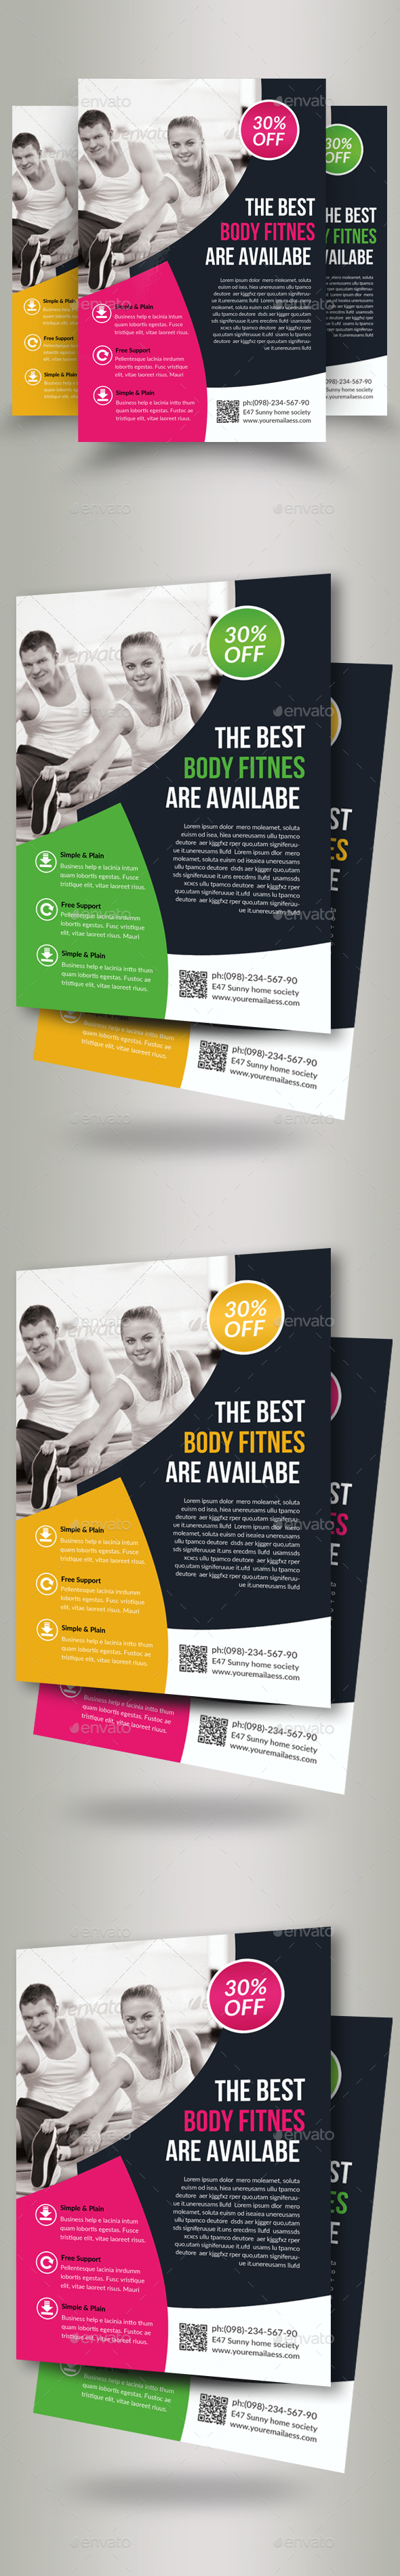 Body Fitness Club Flyers - Flyers Print Templates